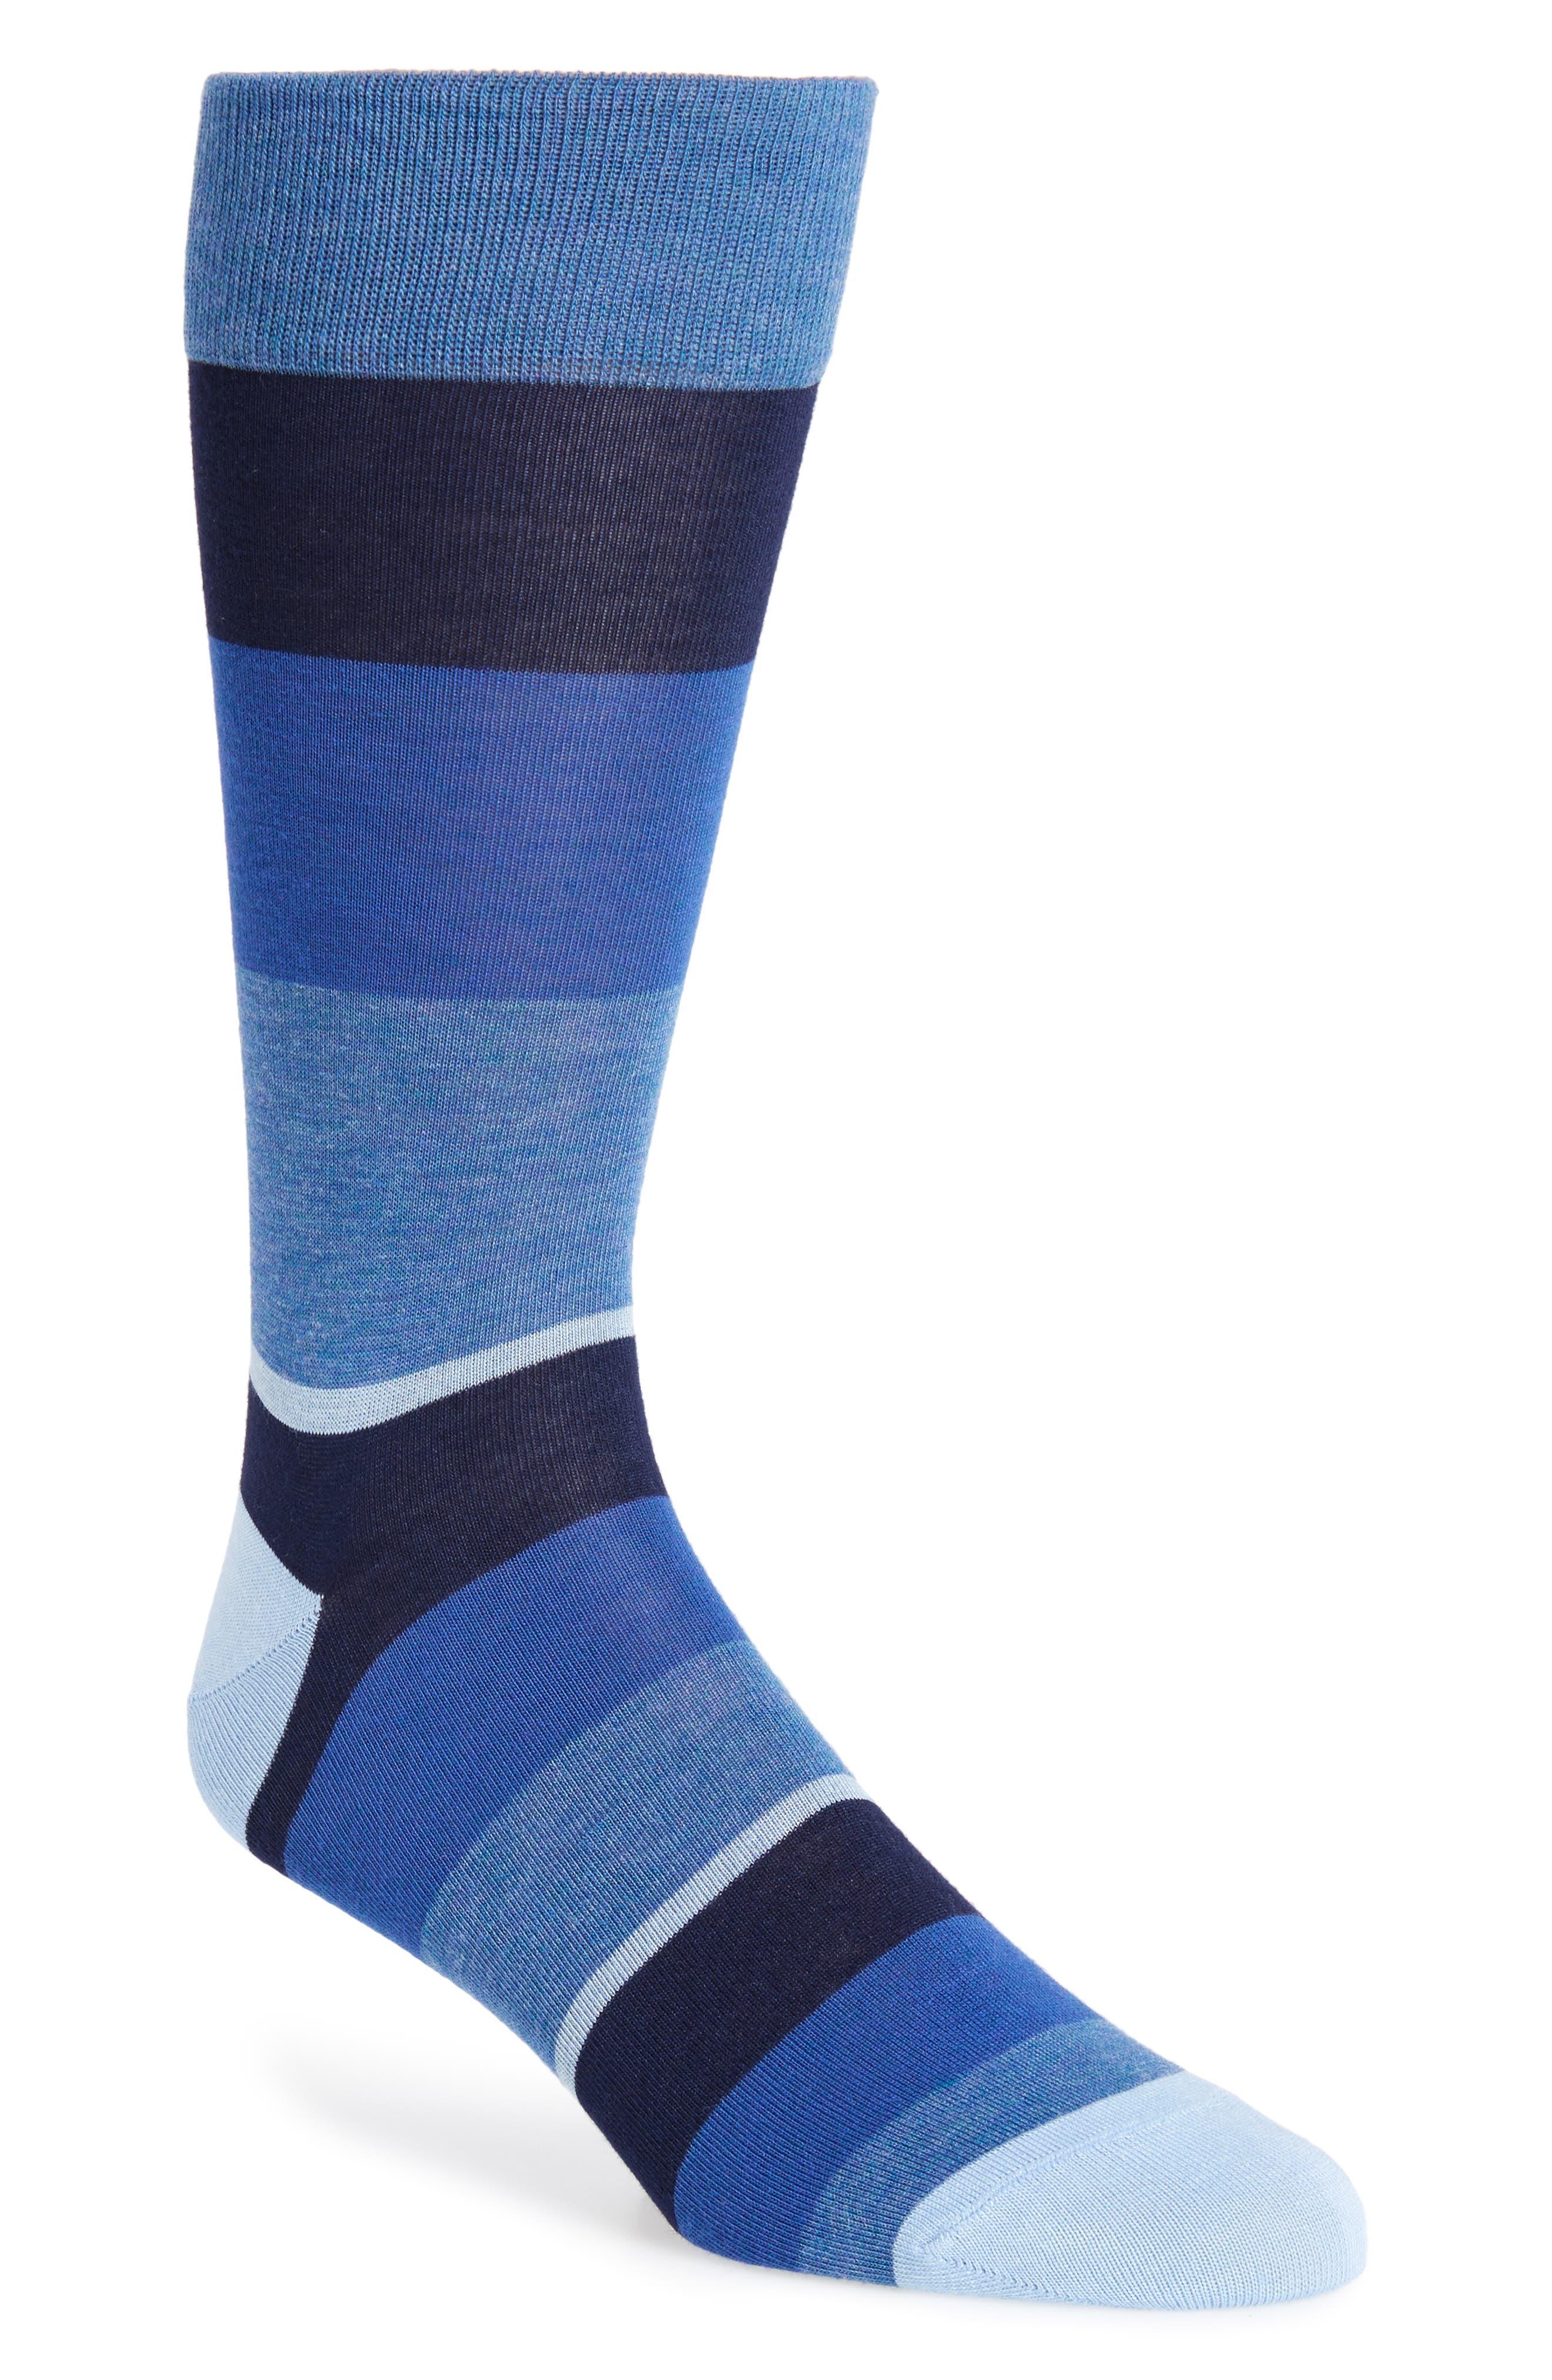 Alternate Image 1 Selected - Calibrate Colorblock Socks (3 for $30)